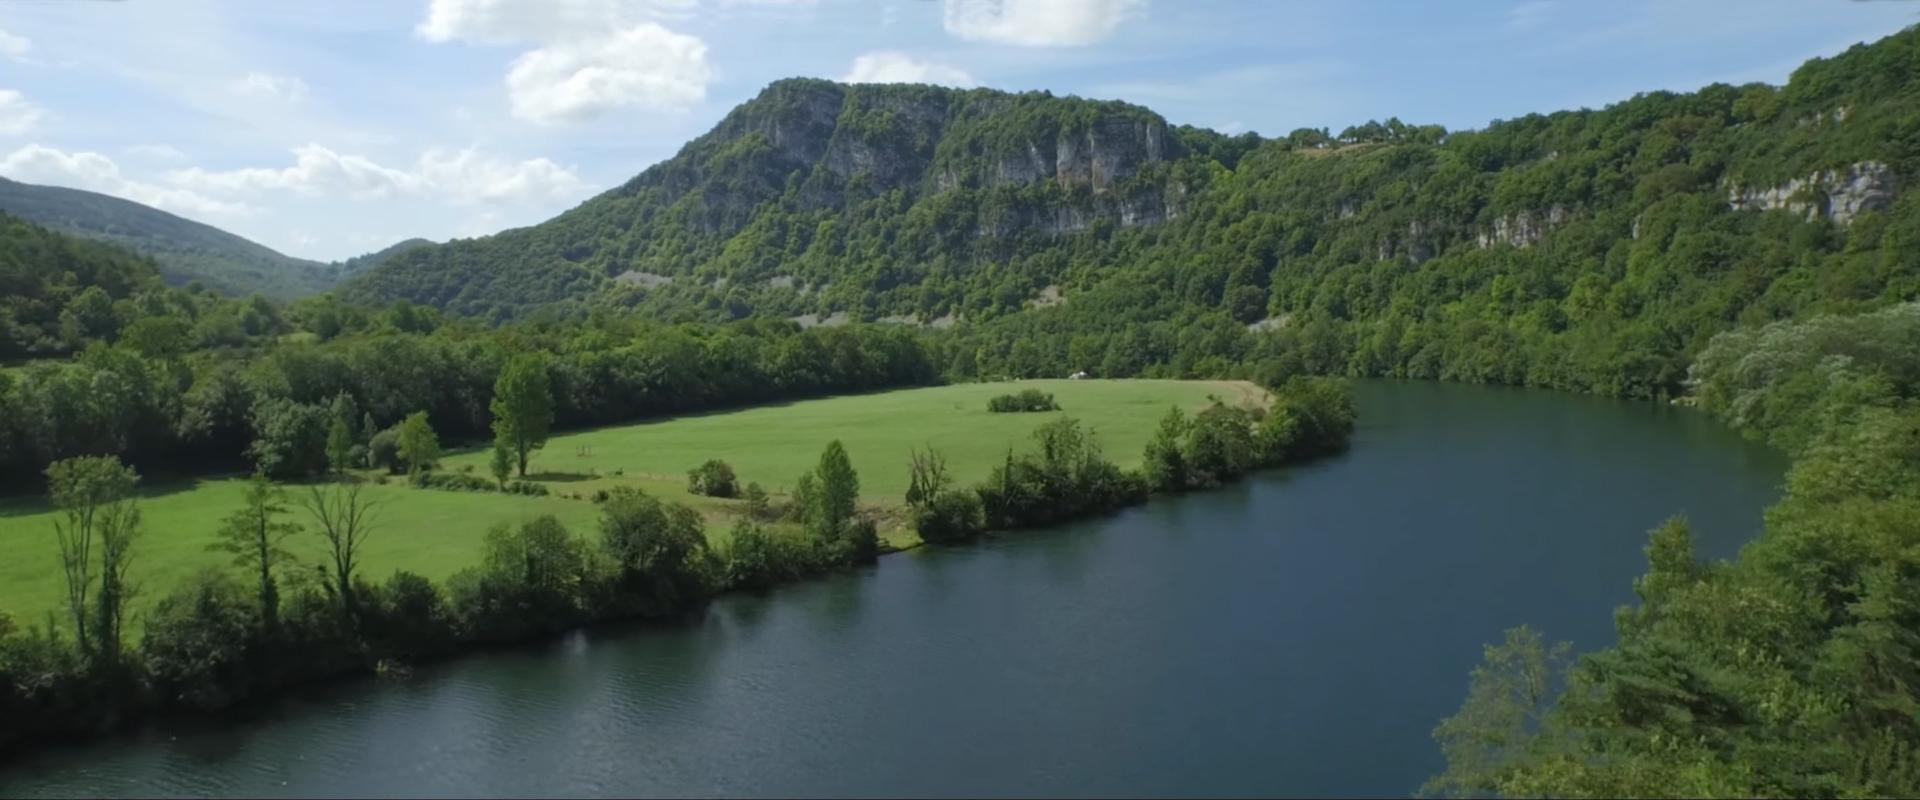 Film Revermont - Tourisme - Nature - Drône